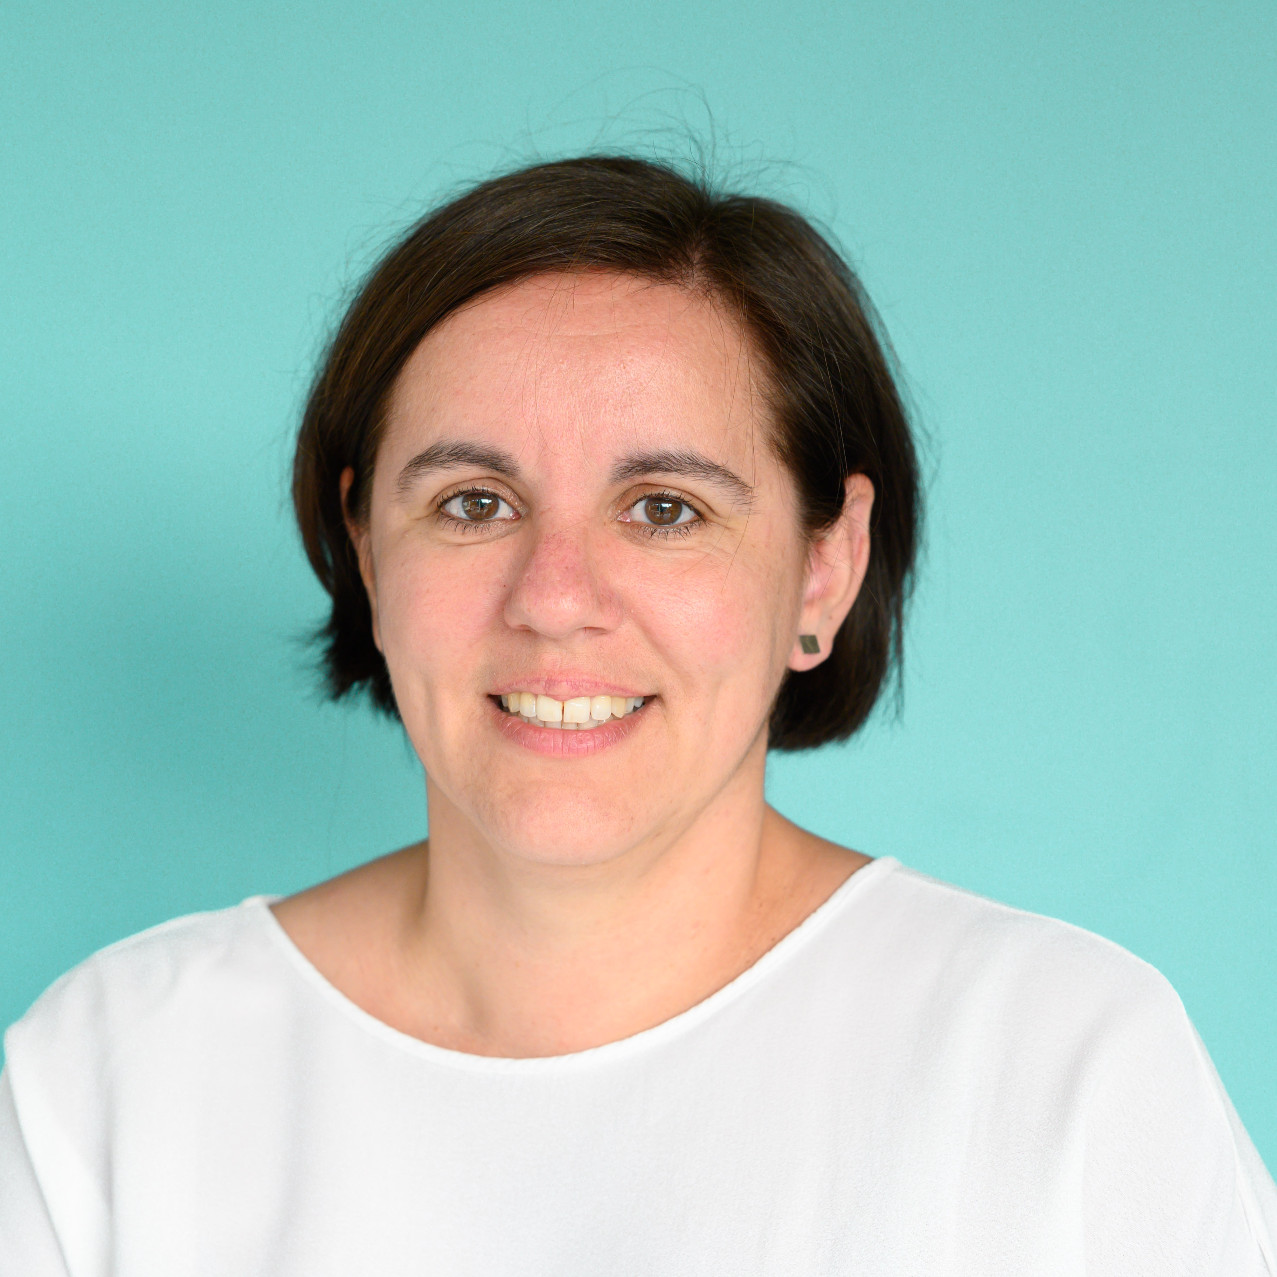 Barbara Van den Abbeele